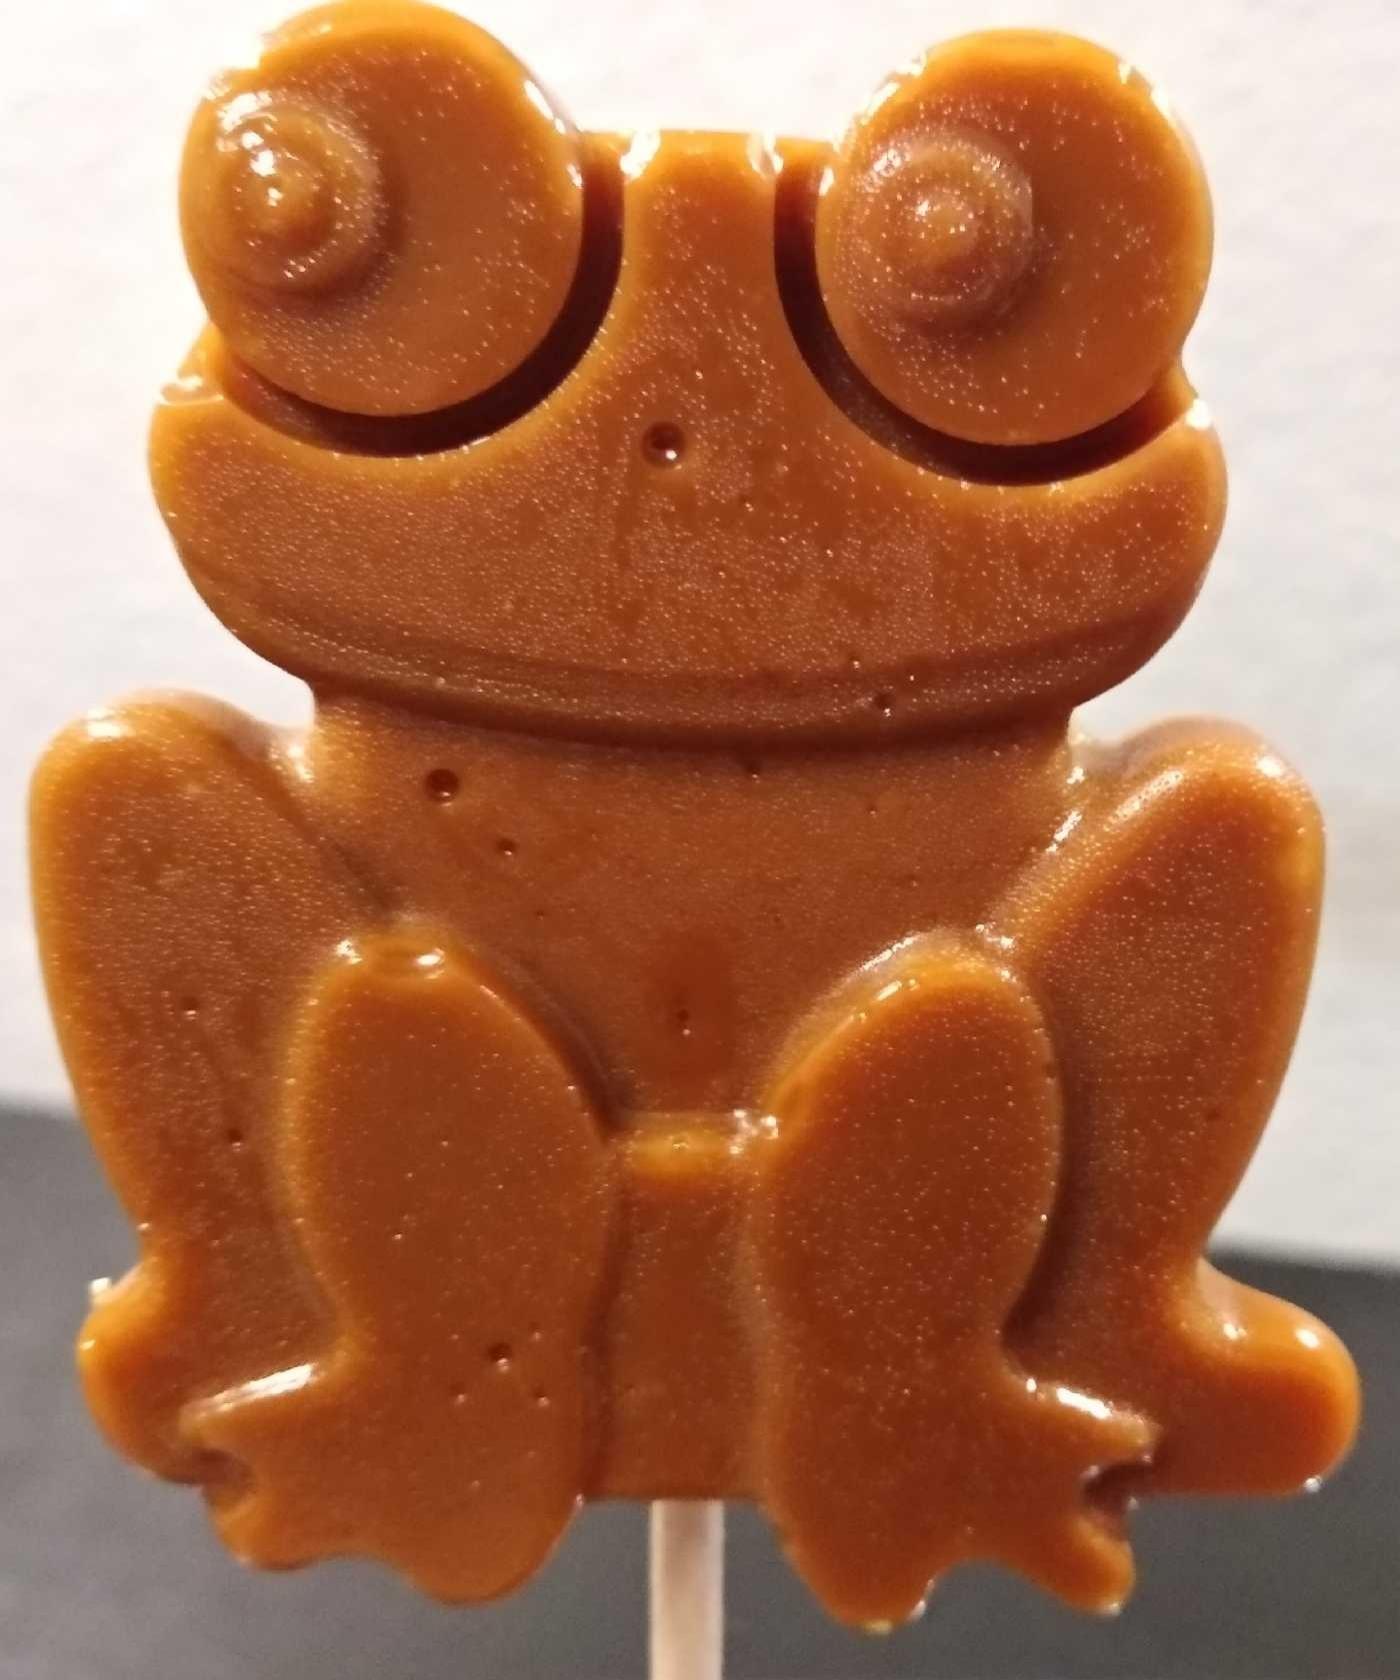 Ma p'tite grenouille caramel